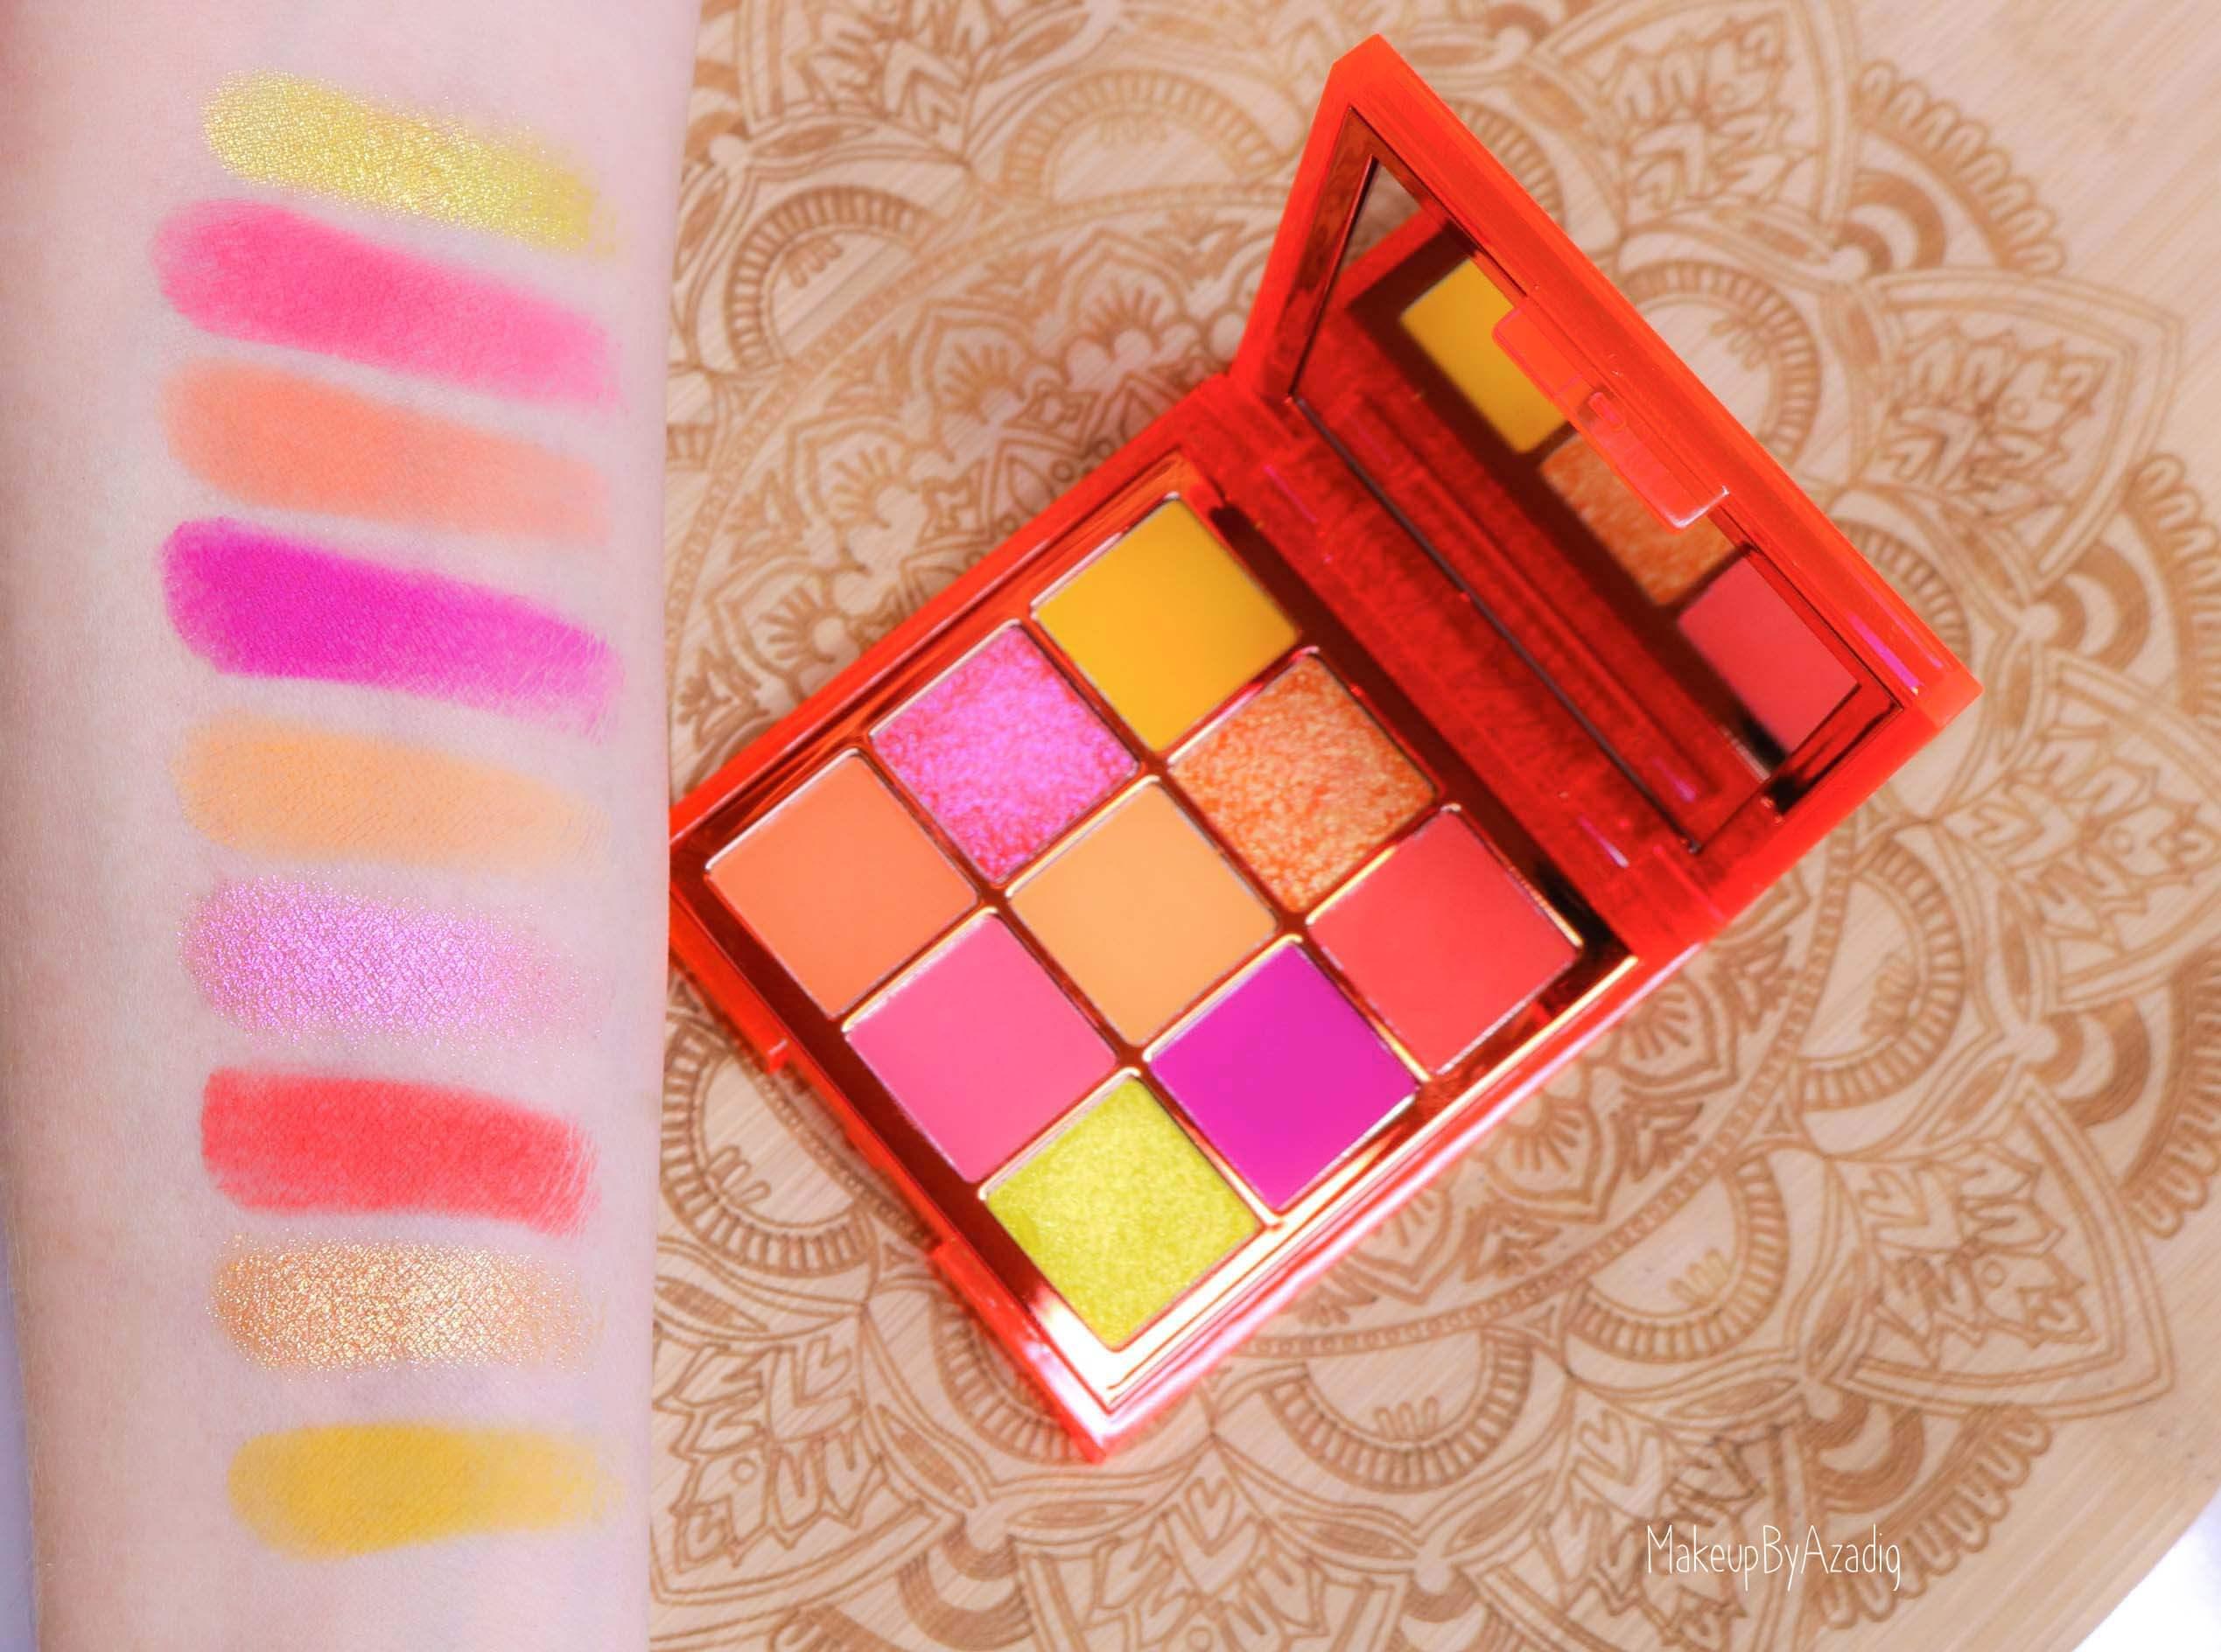 revue-review-palette-neon-obsession-huda-beauty-orange-pink-green-neon-palette-fard-paupieres-fluo-swatch-avis-prix-makeupbyazadig-swatches